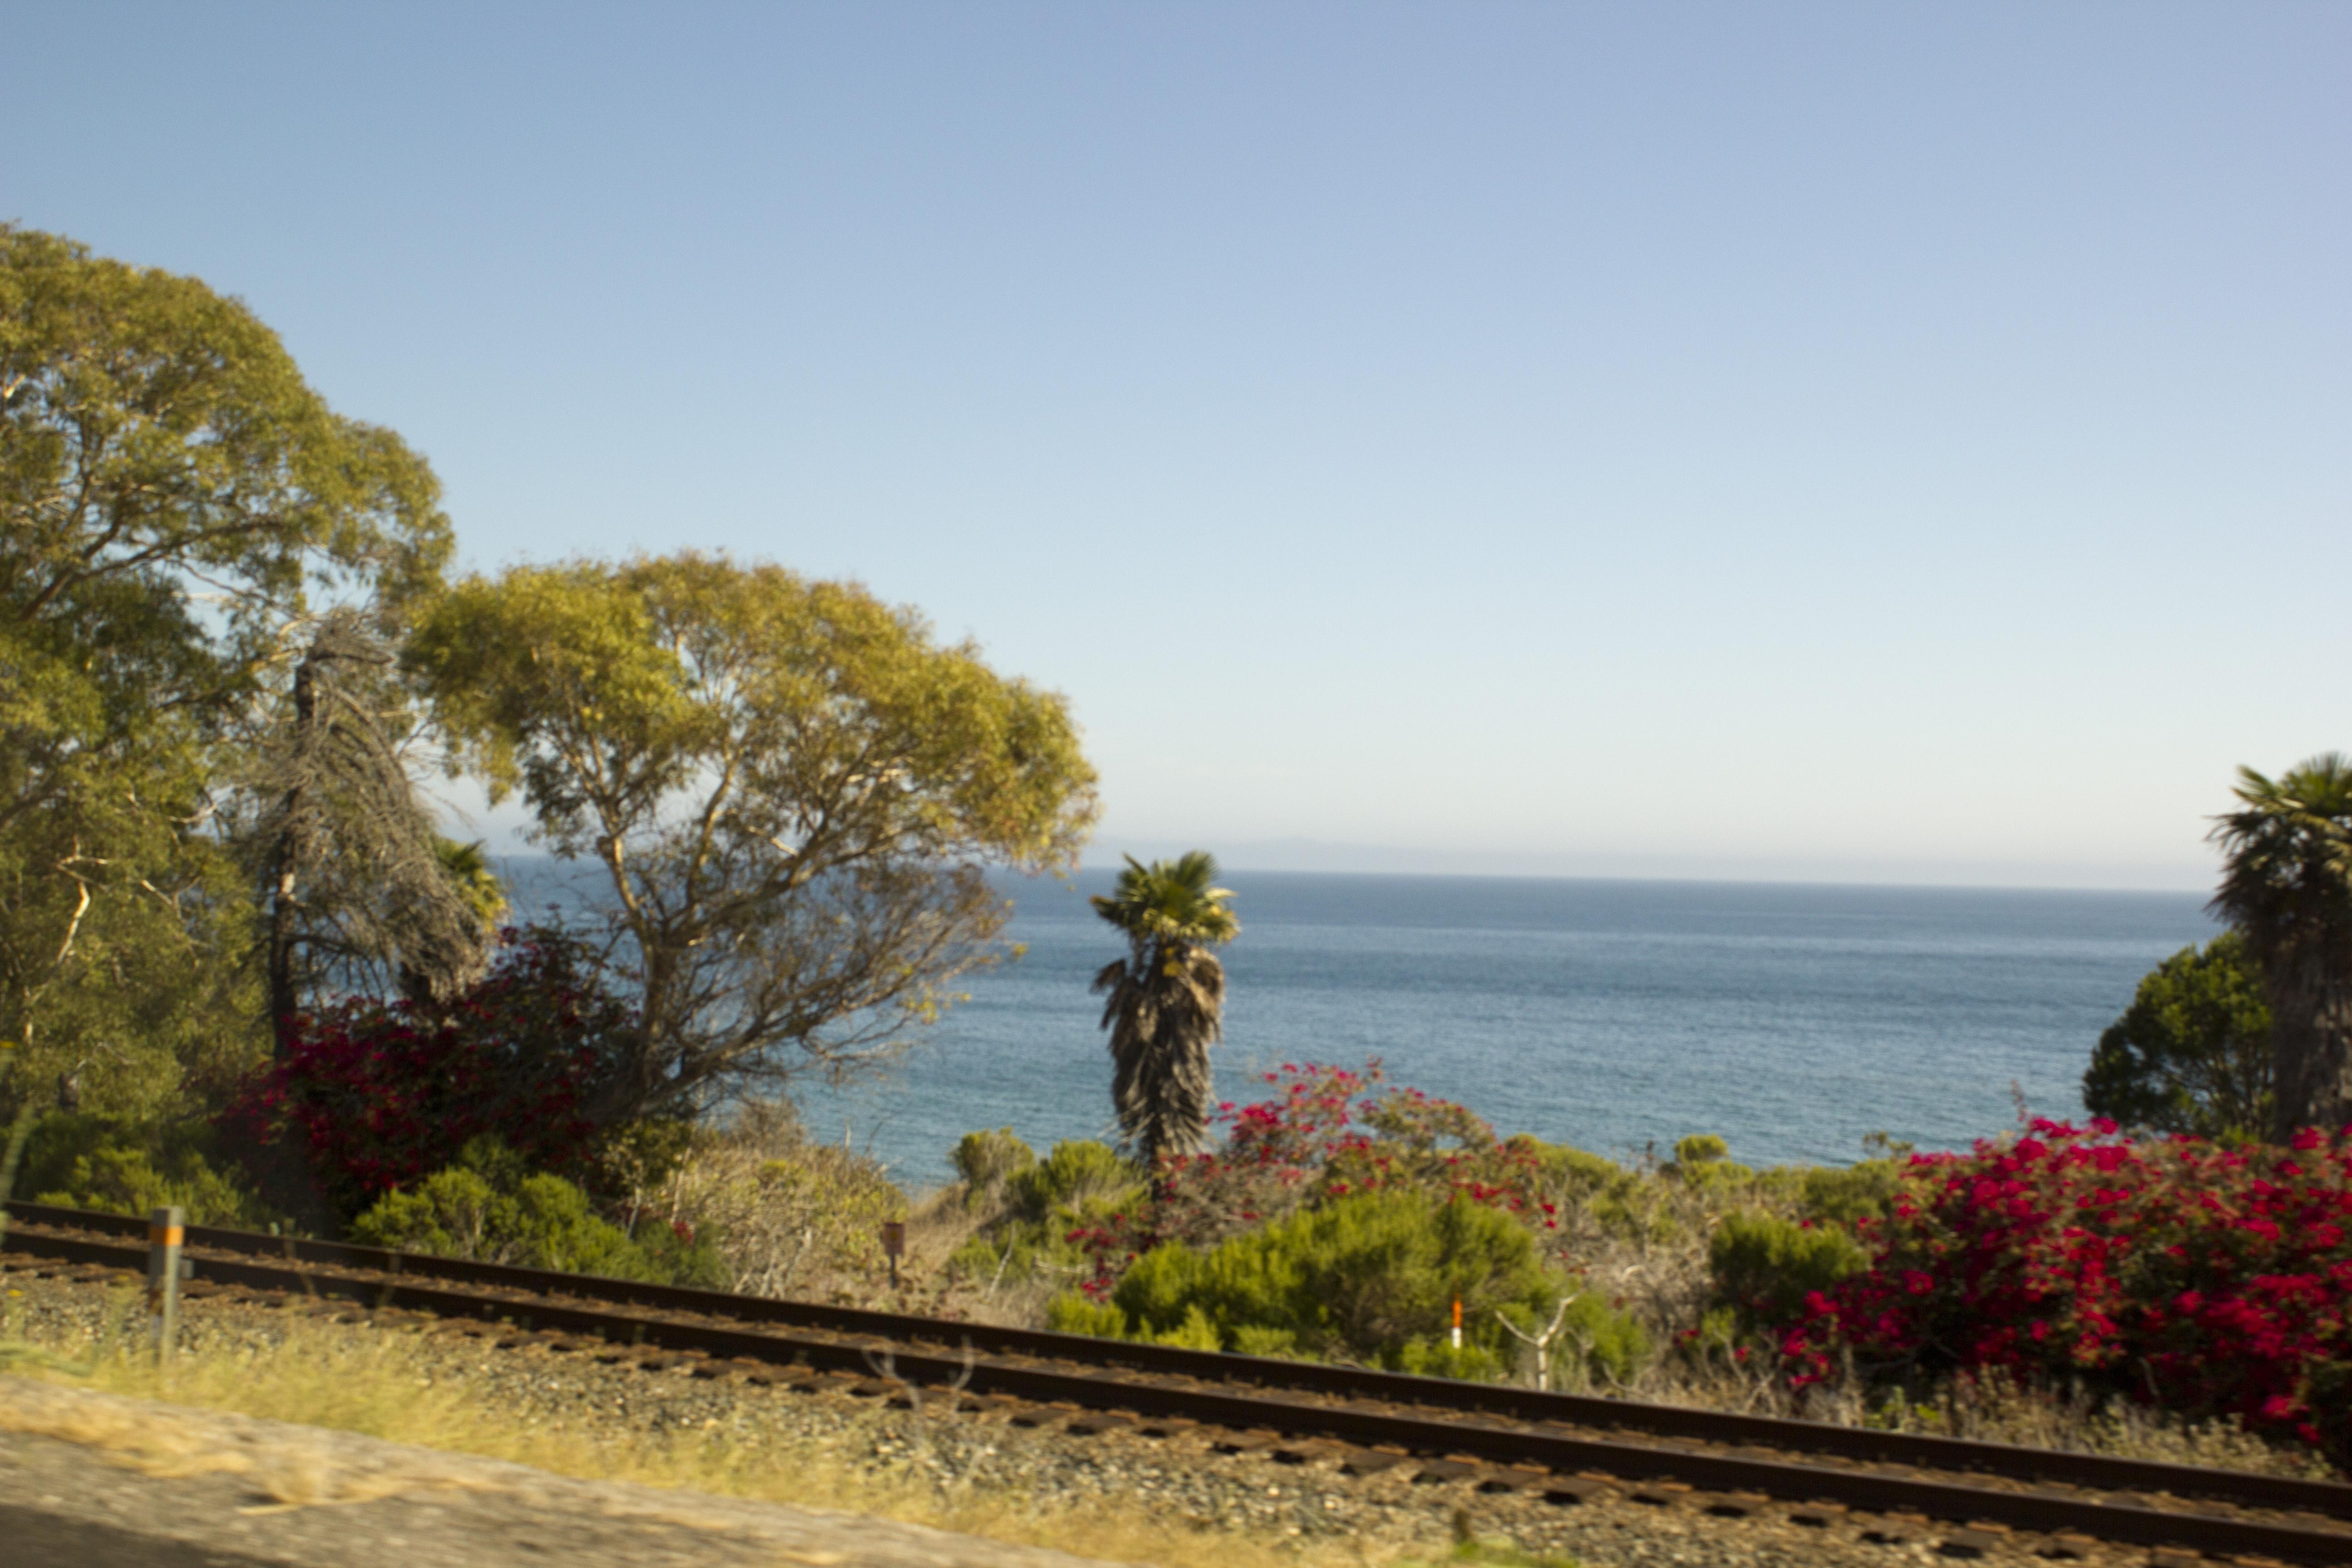 1_road97Фото из авто по дороге №1 из Сан-Франциско в Санта Барбару